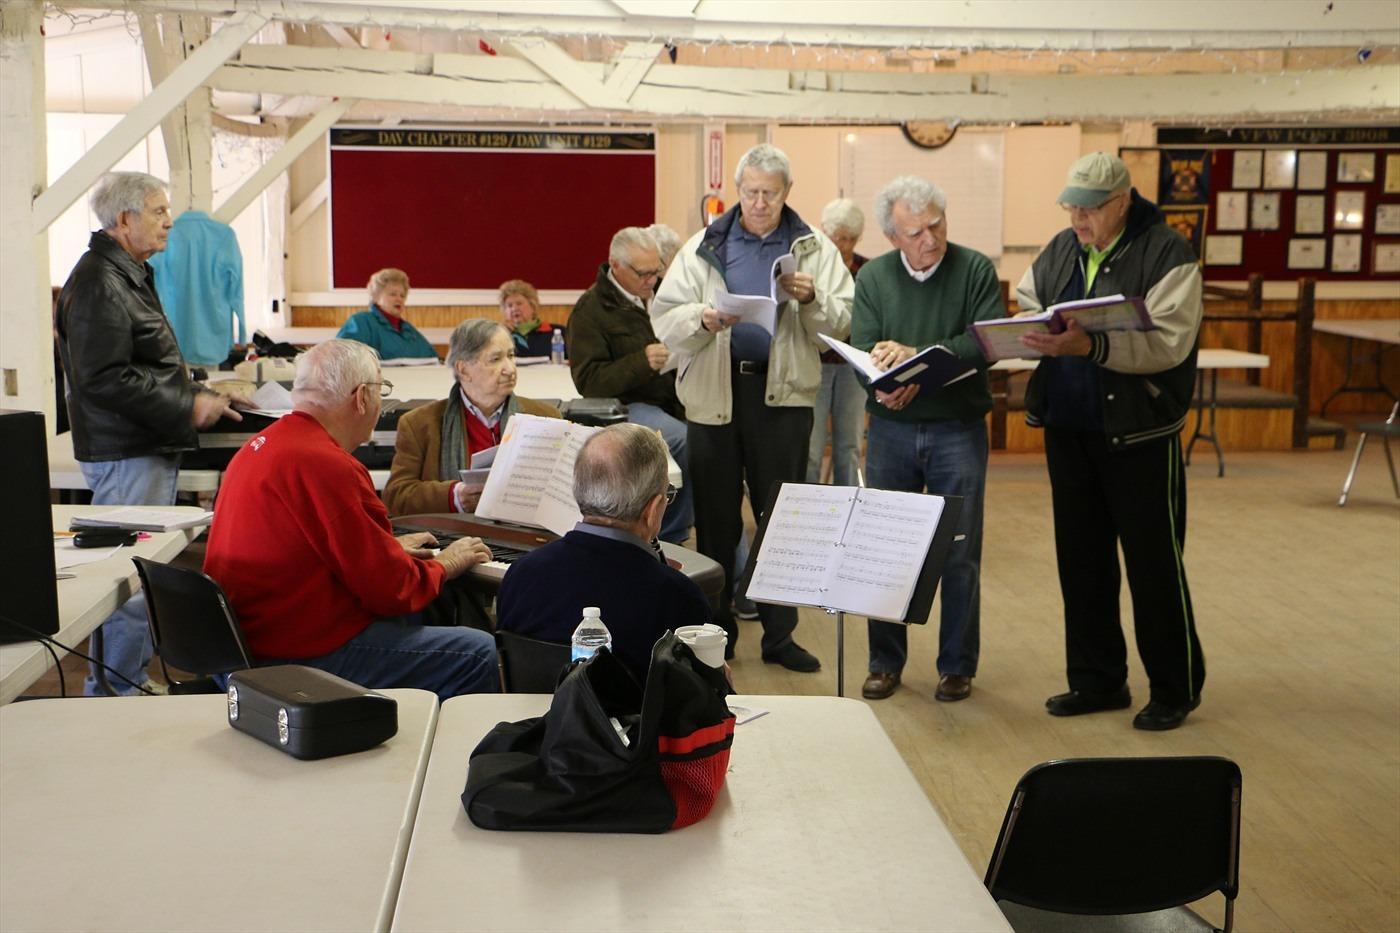 men rehearsing music